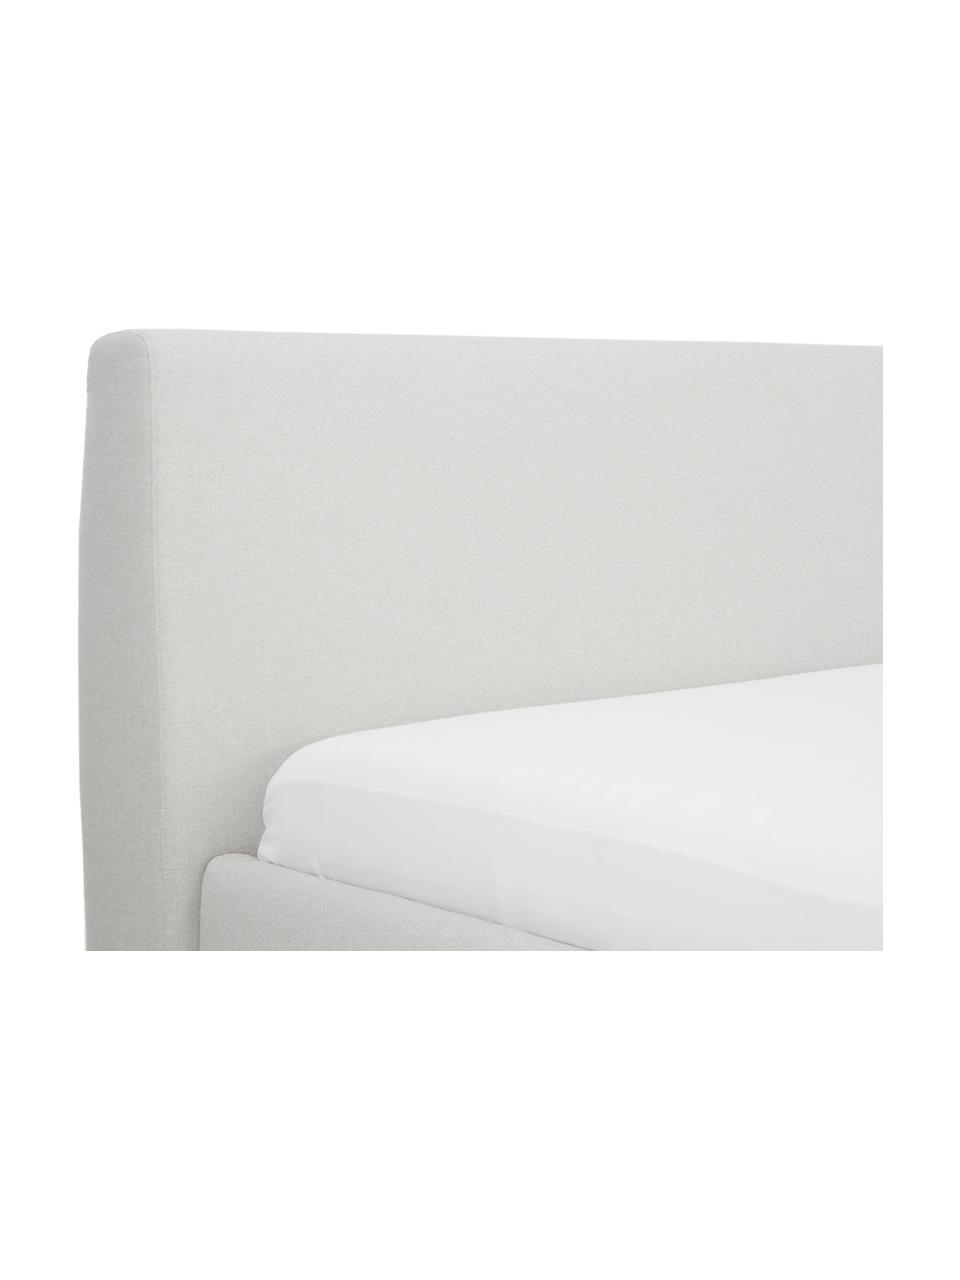 Gestoffeerd bed Cloud met opbergruimte, Frame: massief grenenhout, Bekleding: polyester (structuurmater, Beige, 180 x 200 cm